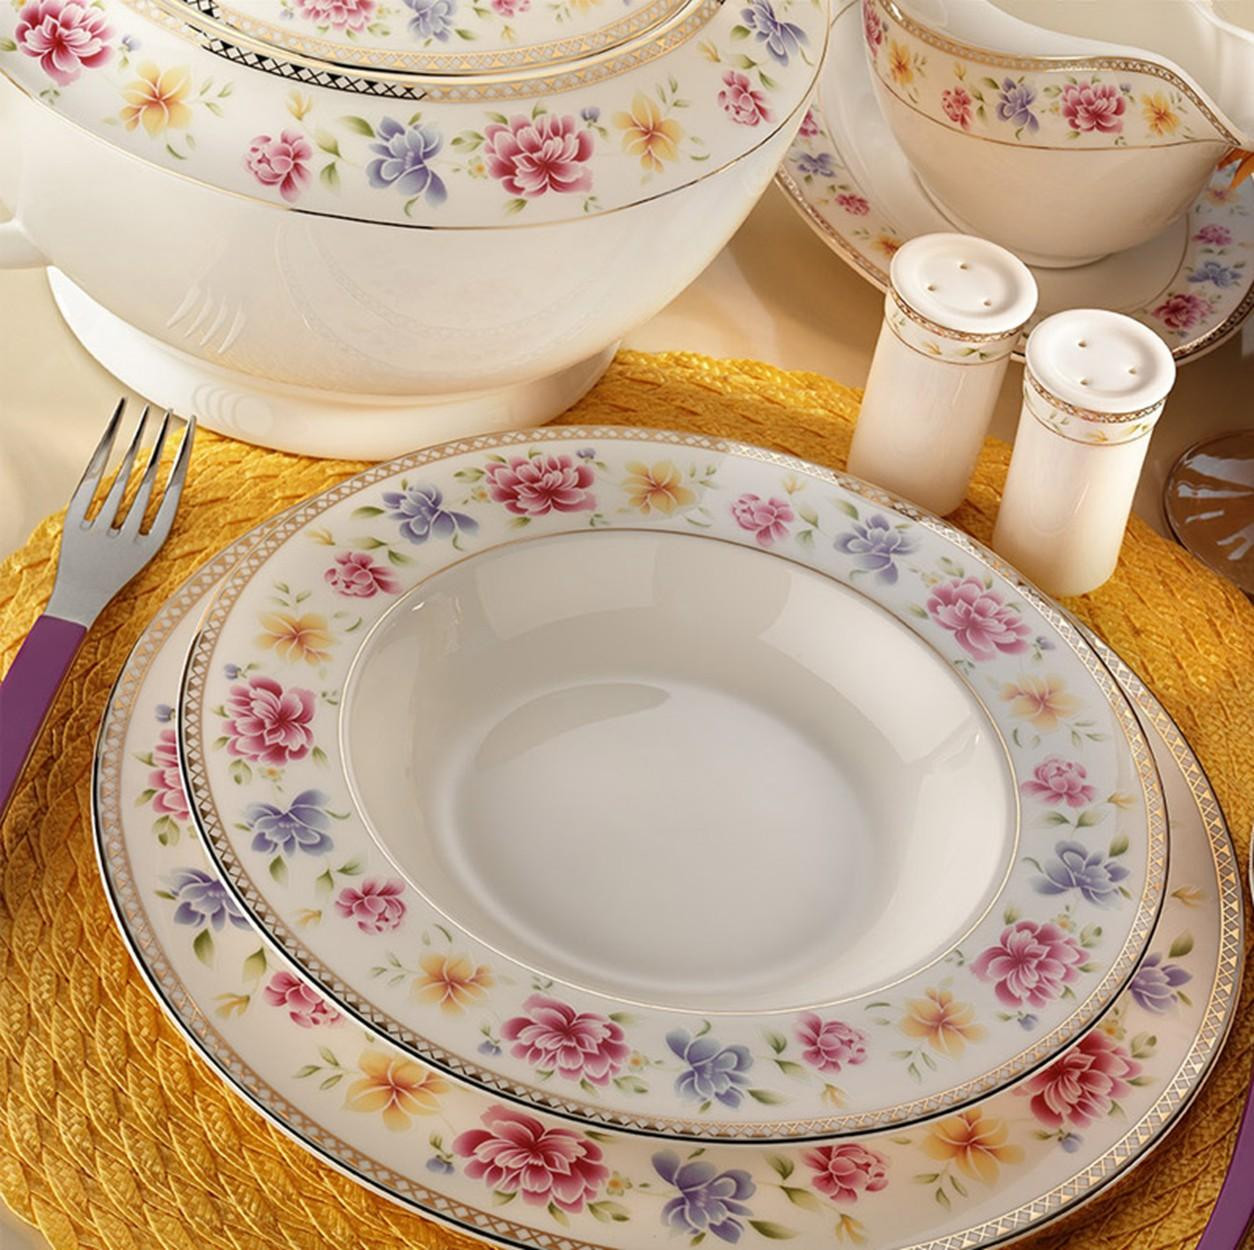 Kutahya Porselen BONE CHINA 84 Pieces 25136 Patterned Dinnerware Set